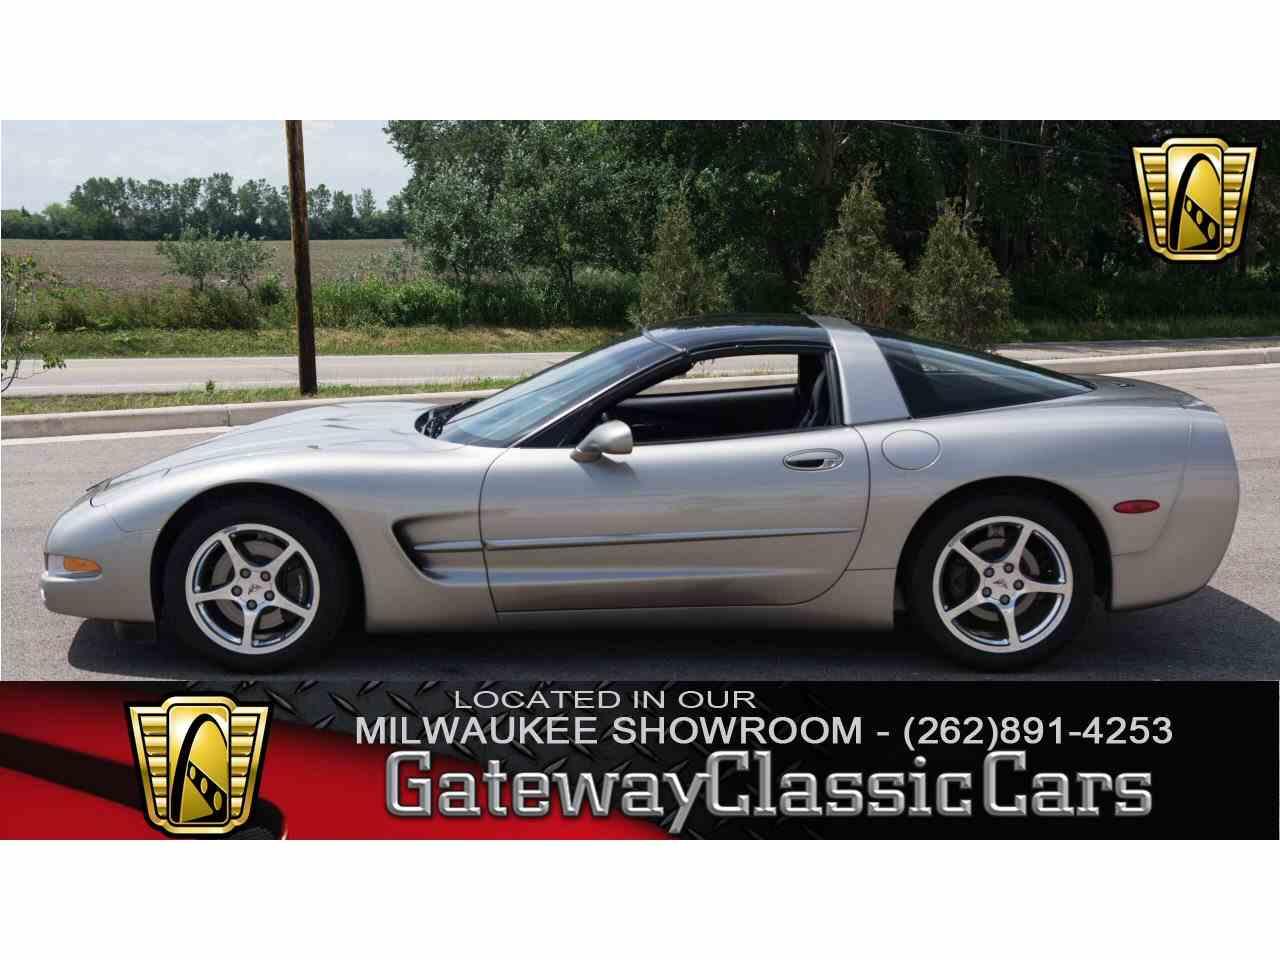 2000 Chevrolet Corvette for Sale - CC-994176